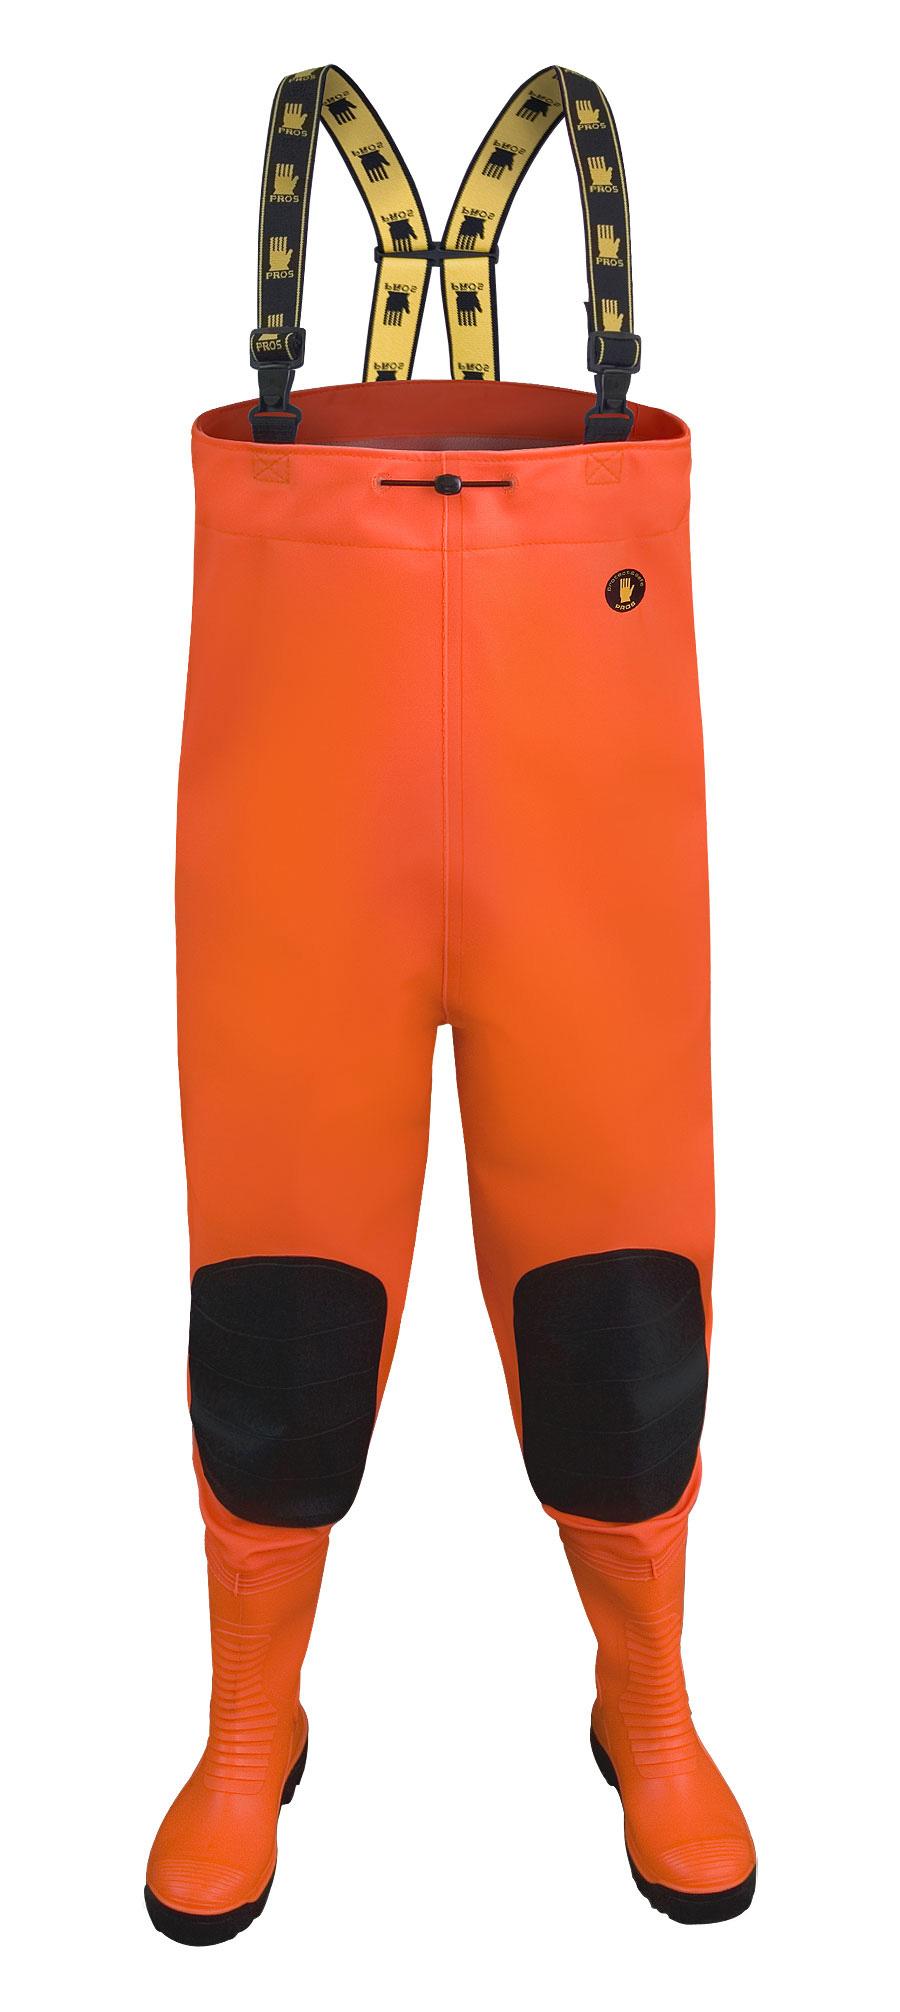 Brodící kalhoty MAX Fluo oranž vel.42    SBM01 Fluo or.  PROS